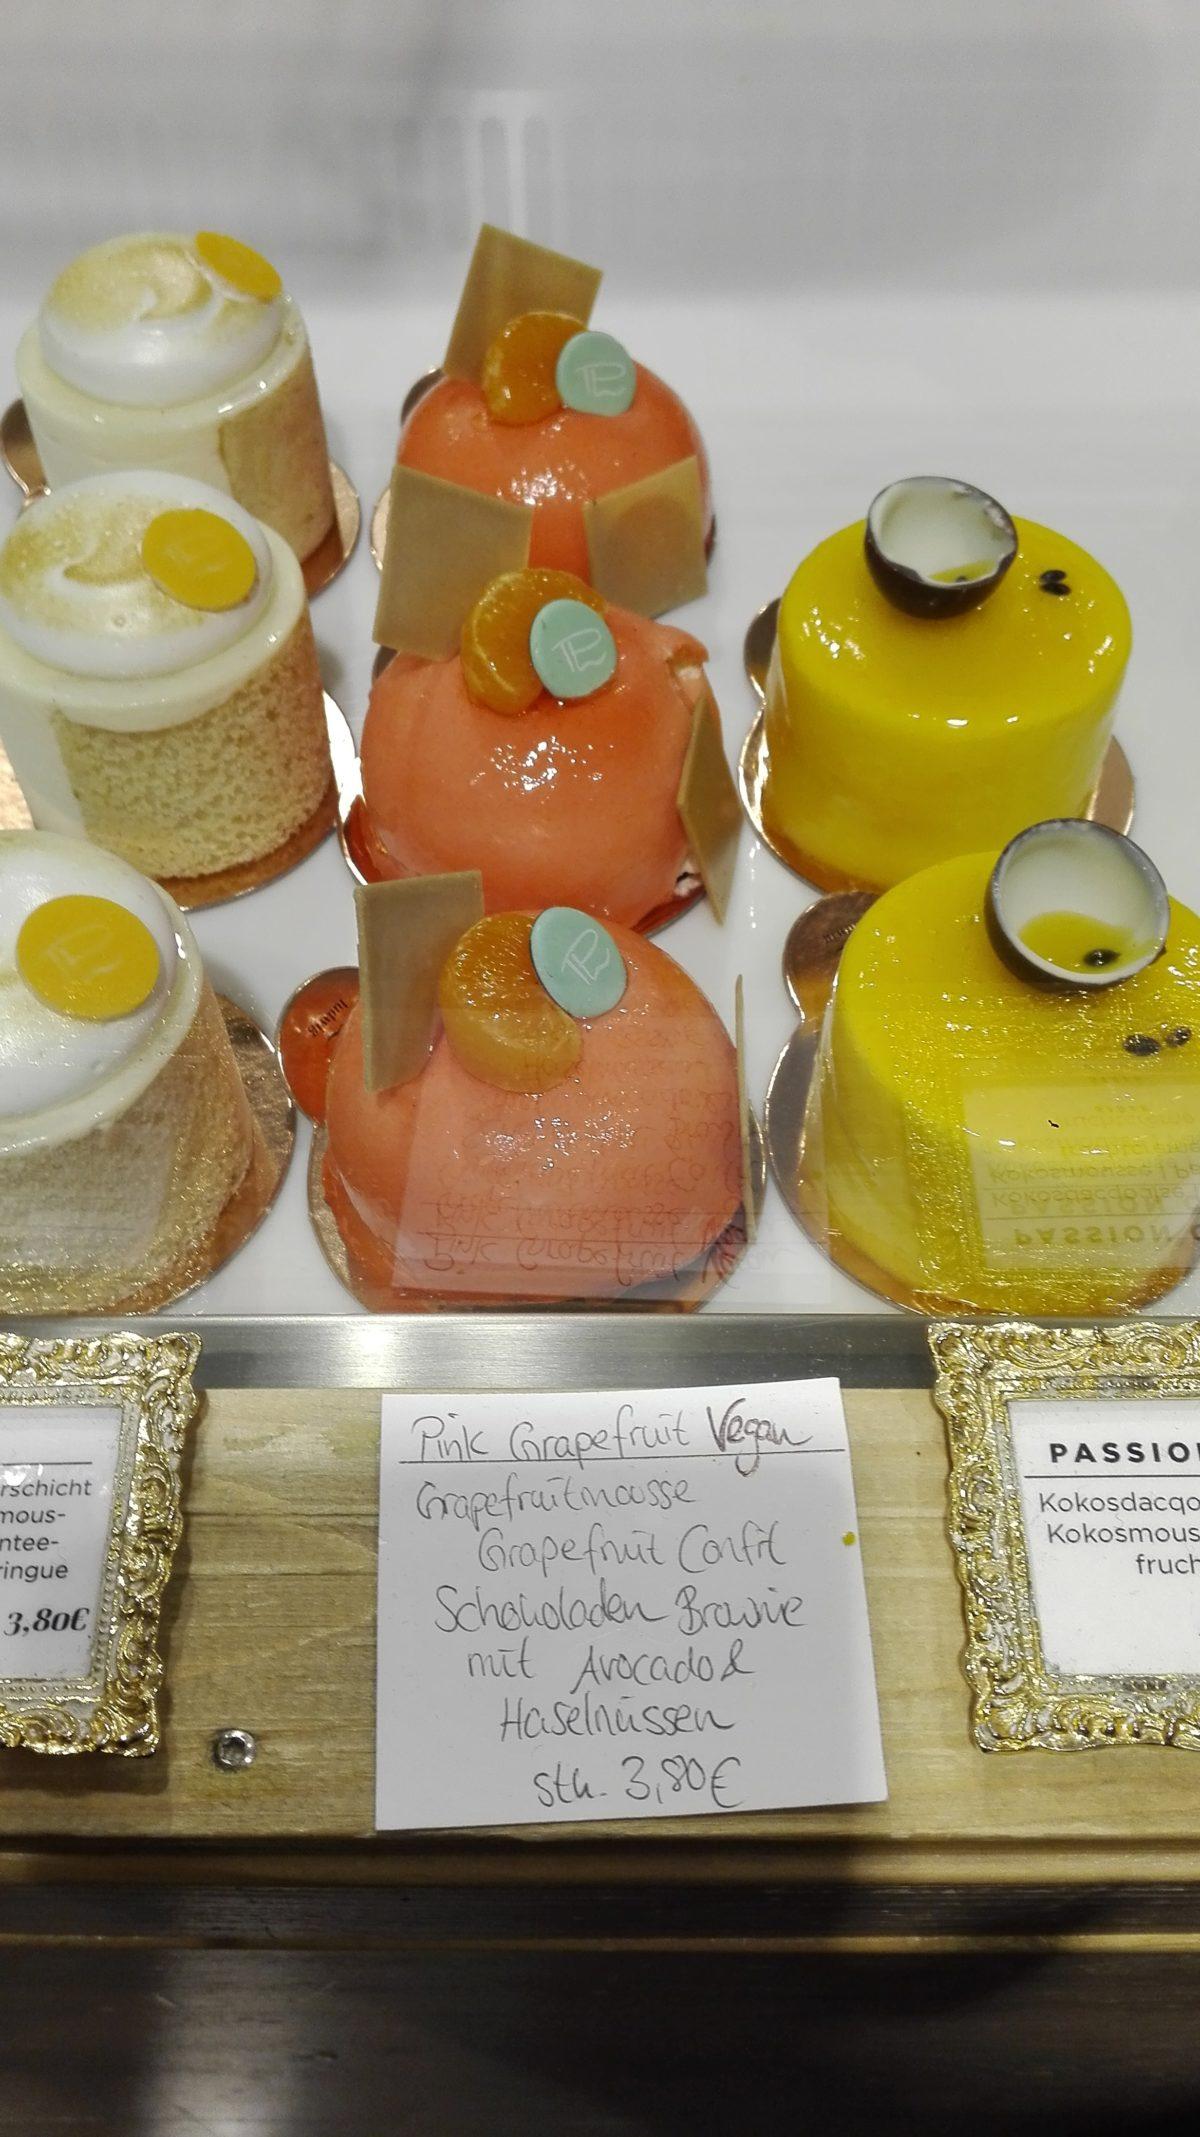 Törtchen der Patisserie Ludwig #Karlsruhe #Cafe| chilibluetendotcom